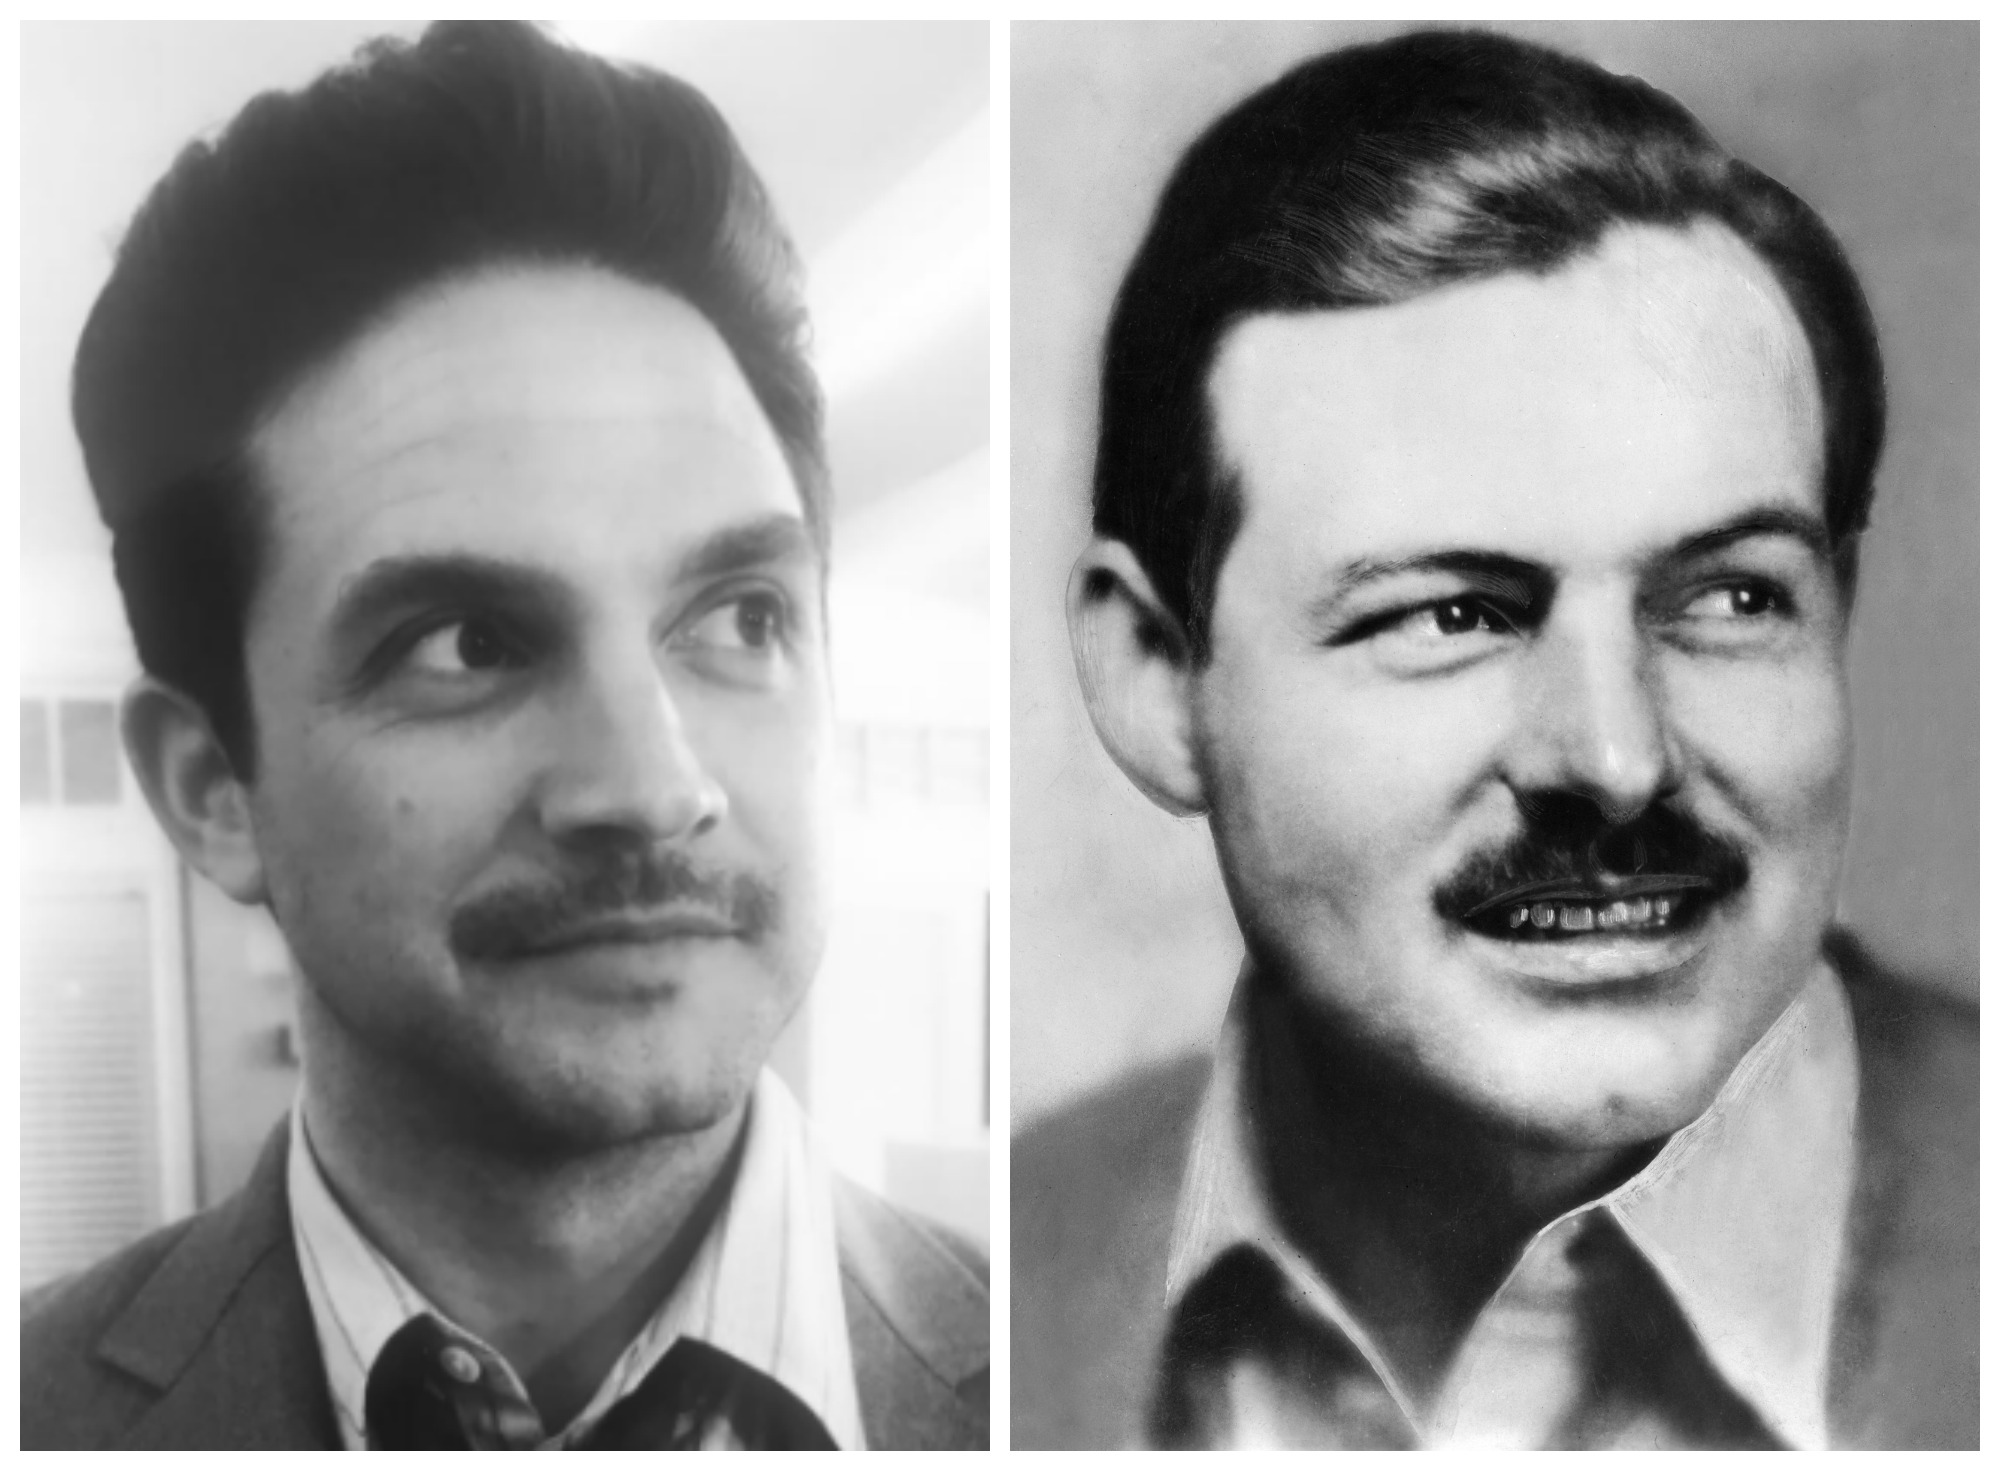 Brandon Barash/Ernest Hemingway - Instagram/Getty